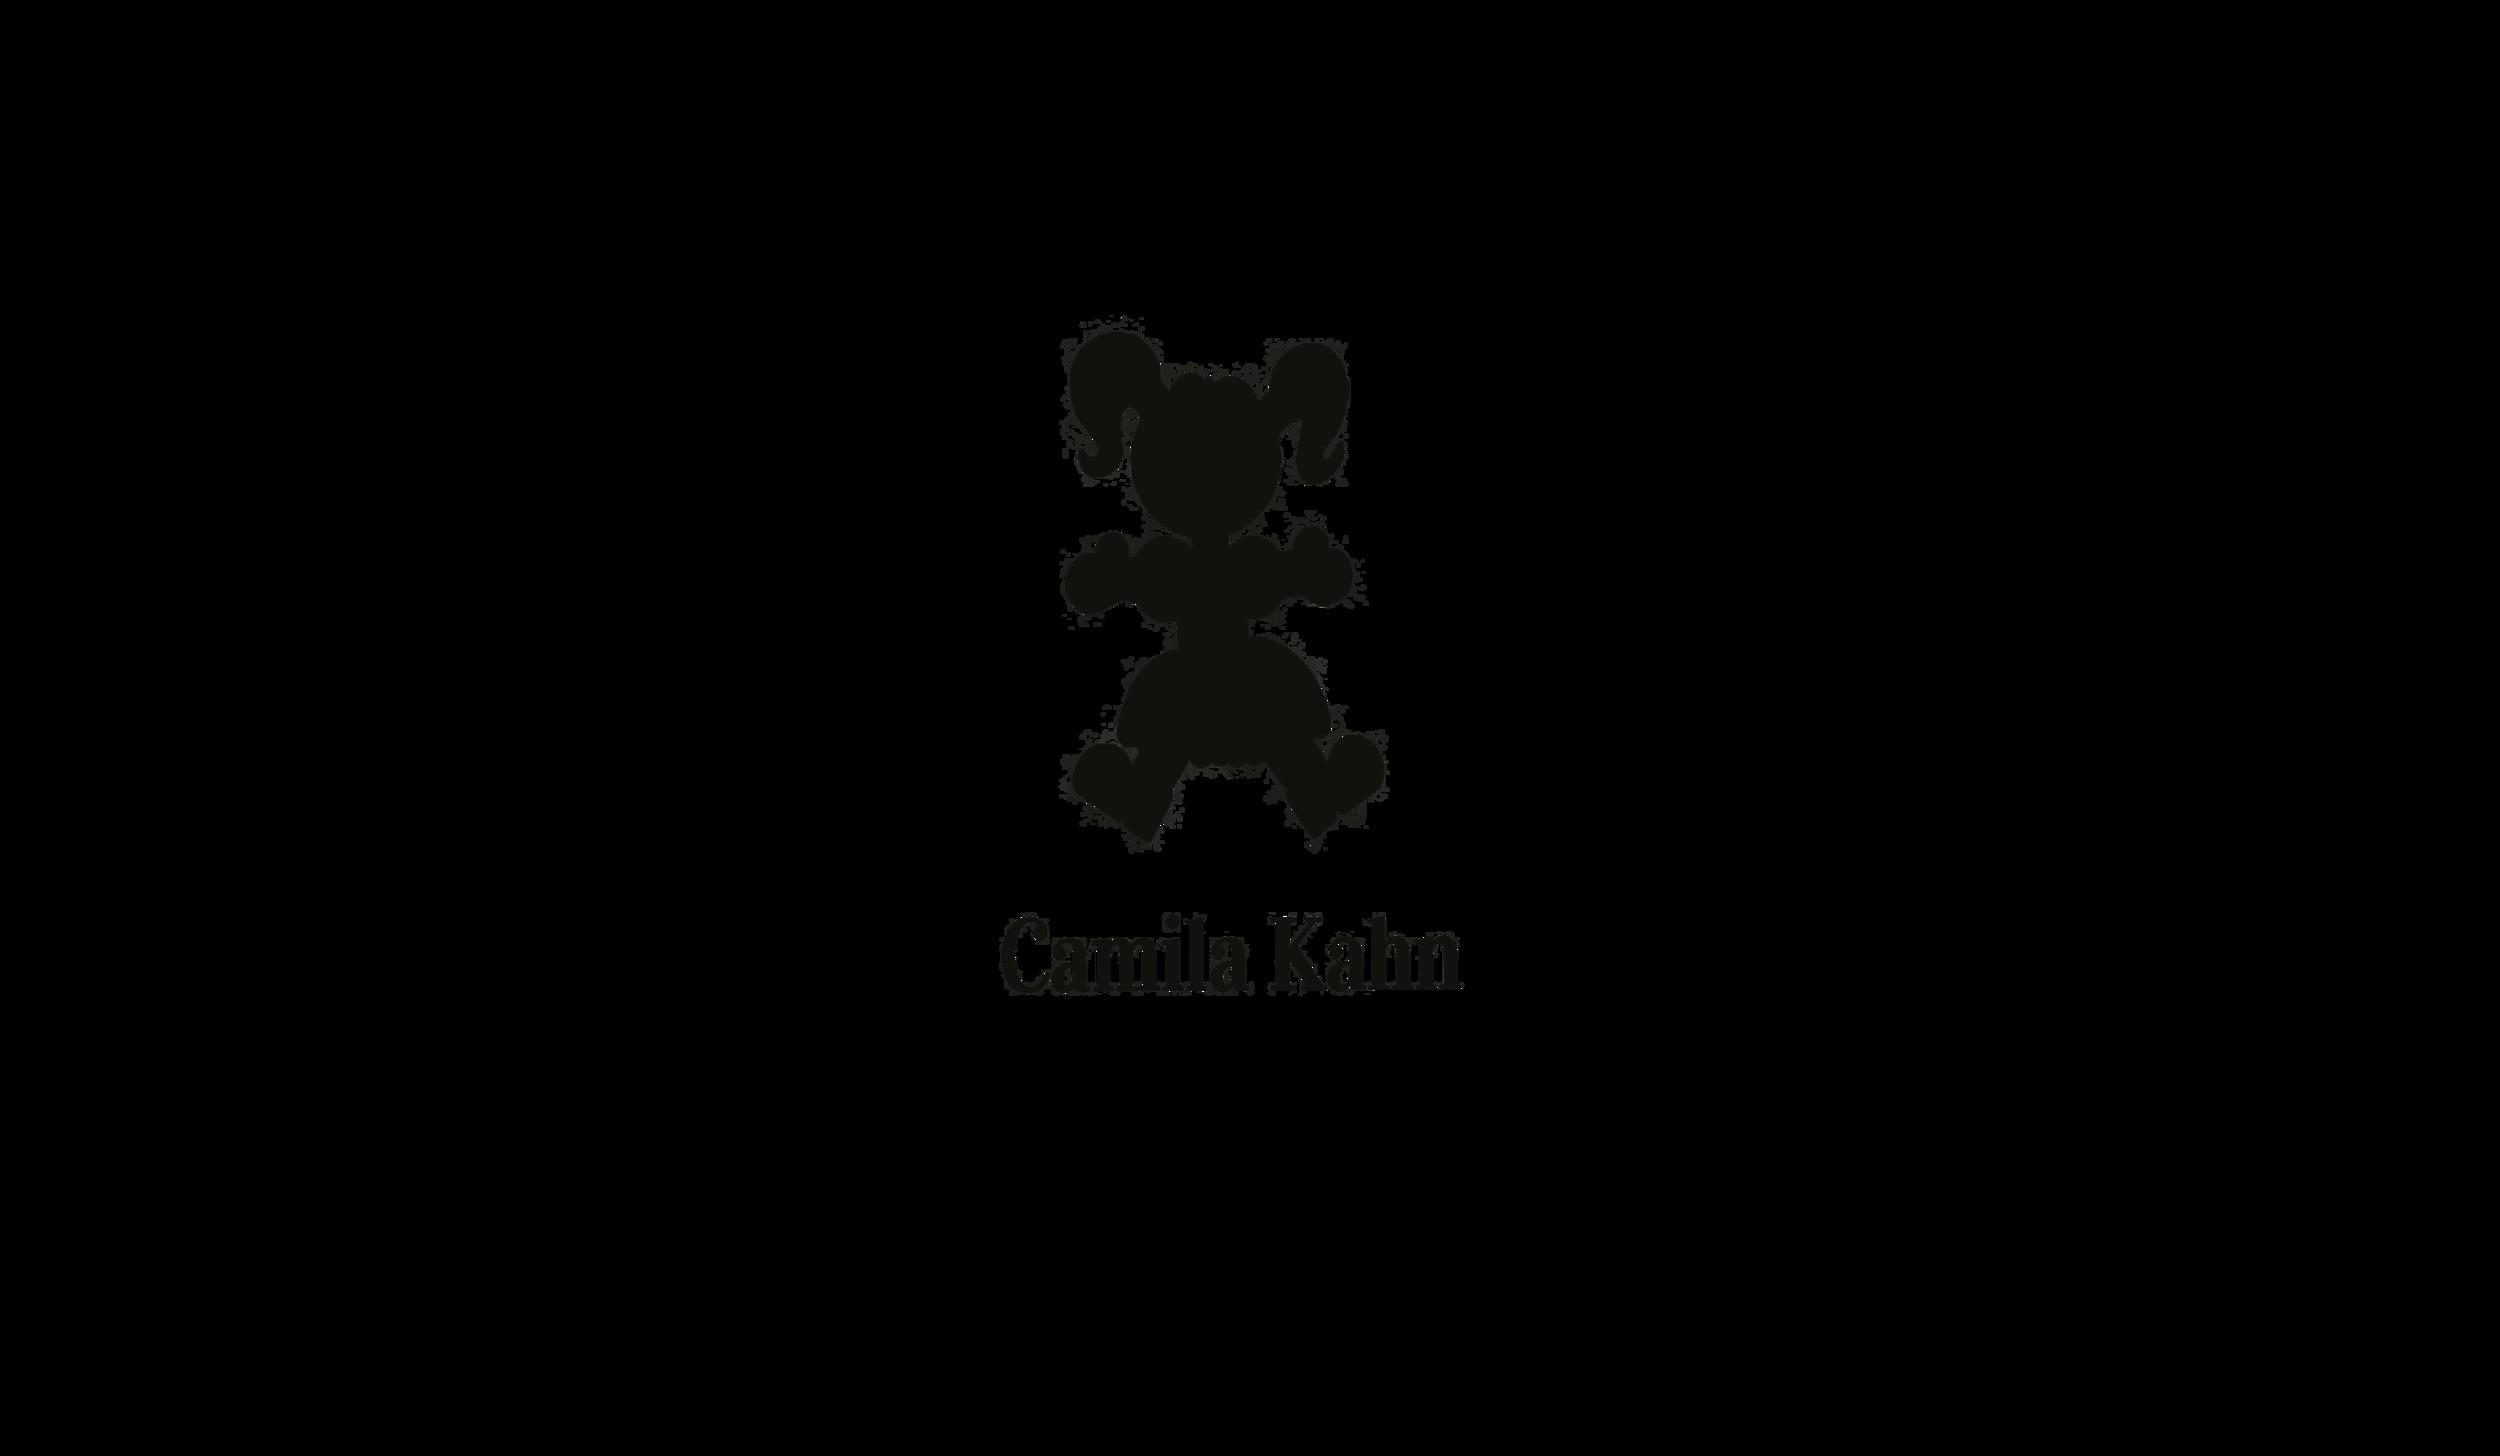 Untitled1-copy_0020_logo-camila-kahn.pdf.png